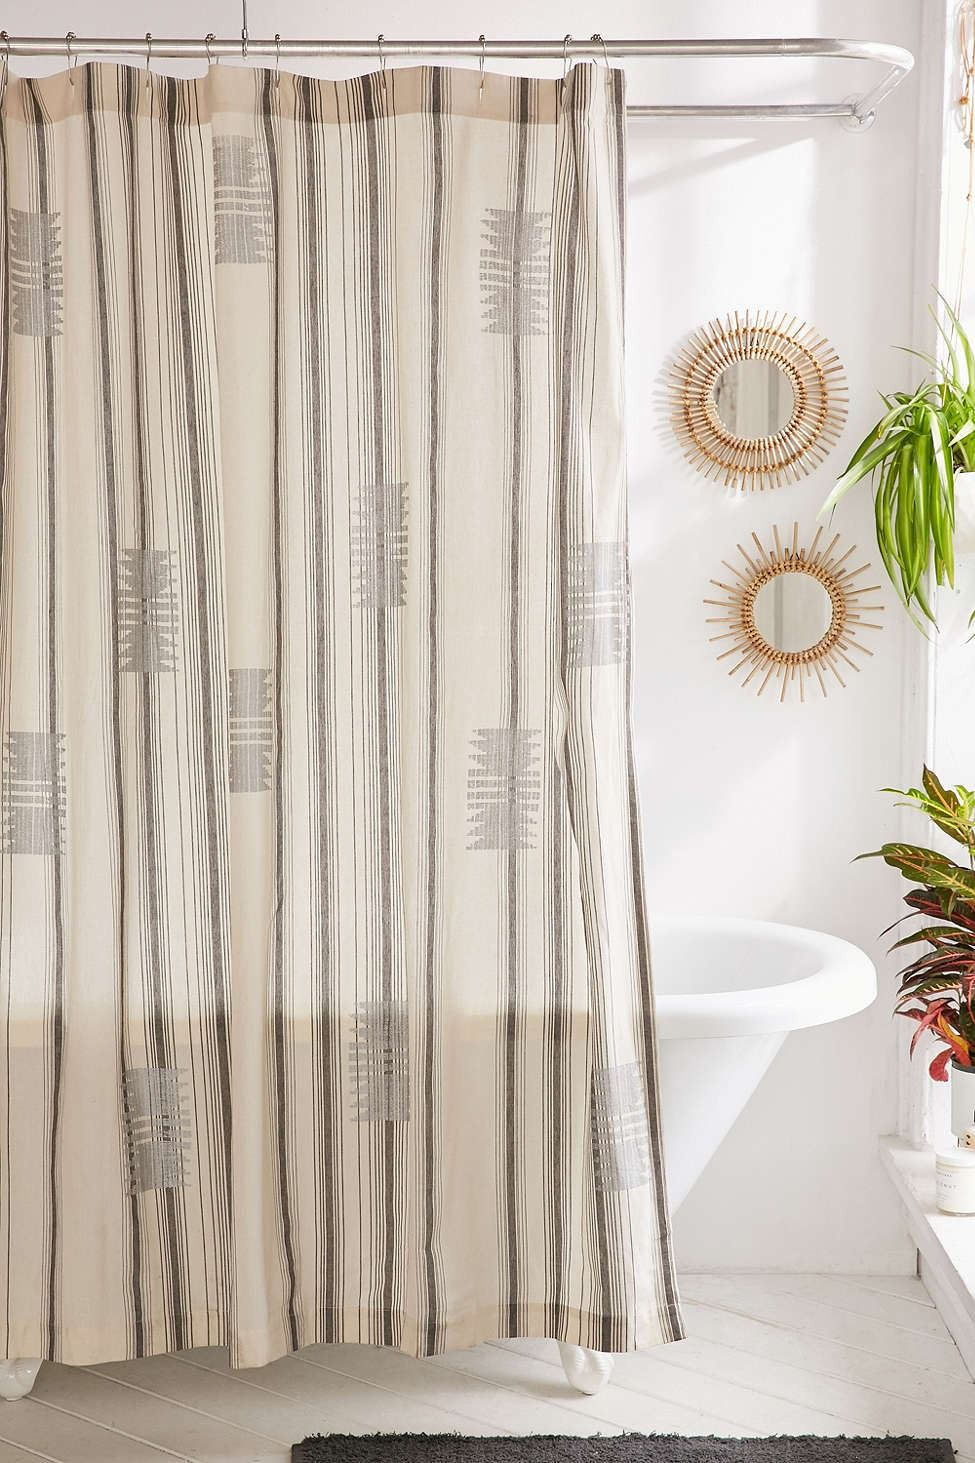 Copper Shower Curtain Hooks Set Modern Shower Curtains Unique Shower Curtain Bathroom Curtain Set